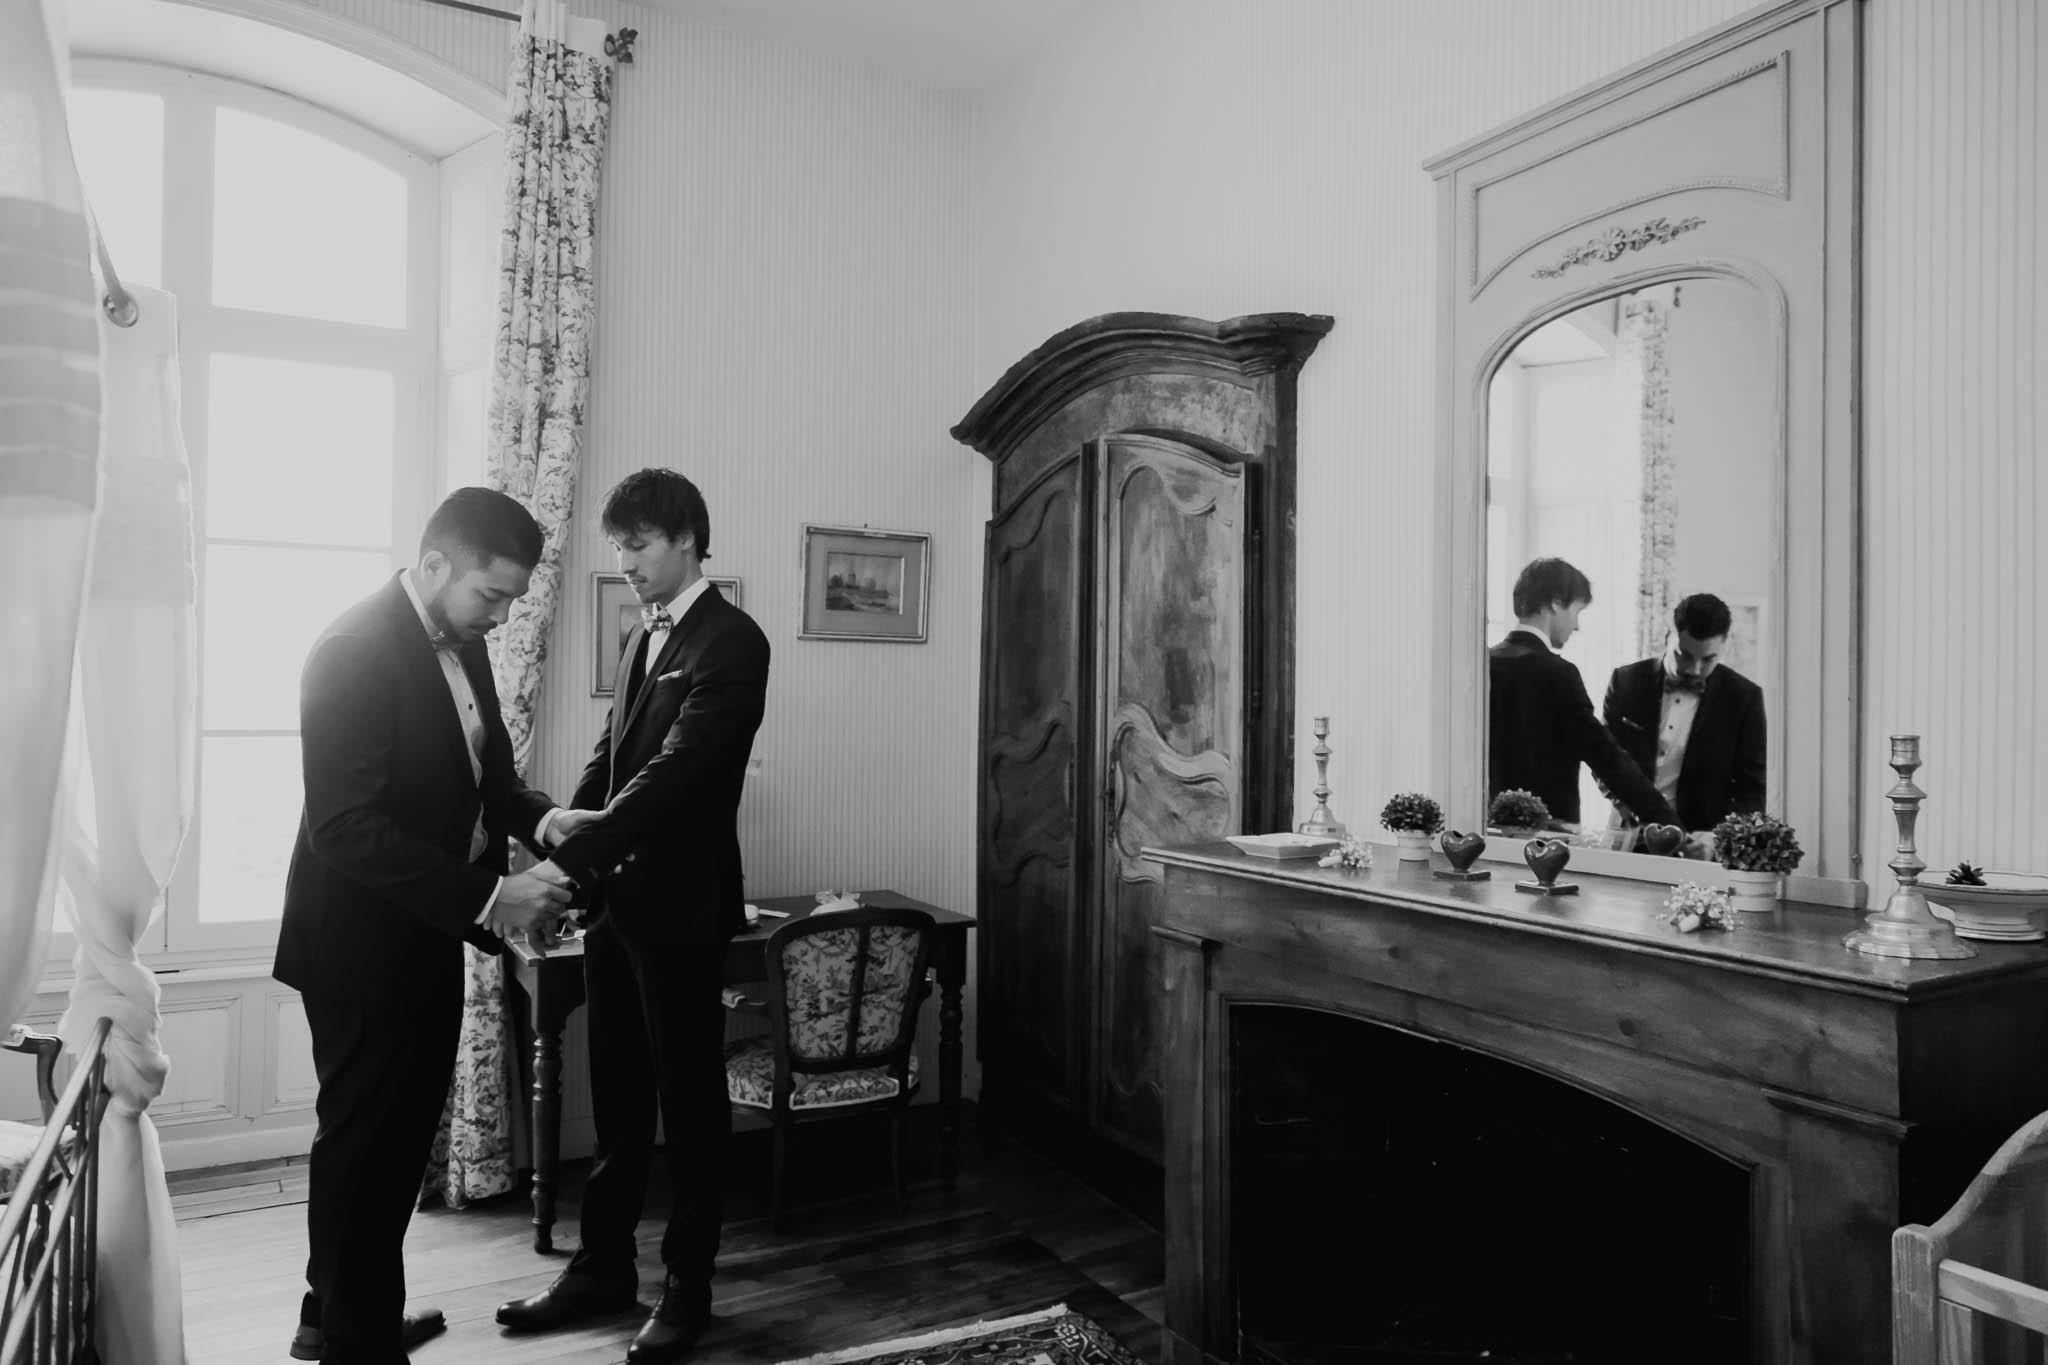 mariage-chateau-gaudras-ingold-17.jpg